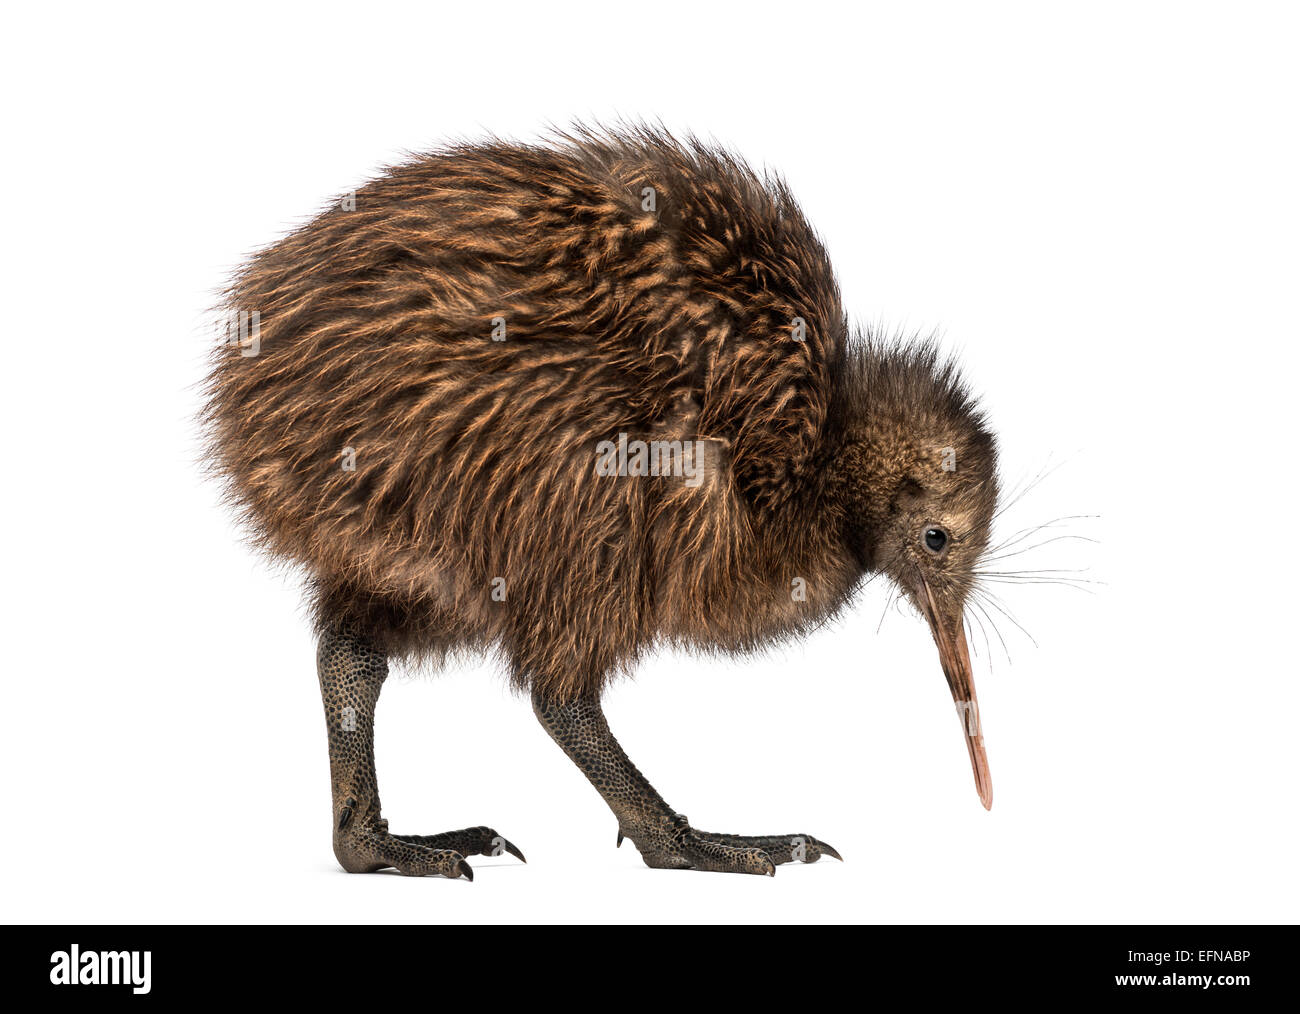 North Island Brown Kiwi, Apteryx mantelli, 3 months old, against white background - Stock Image